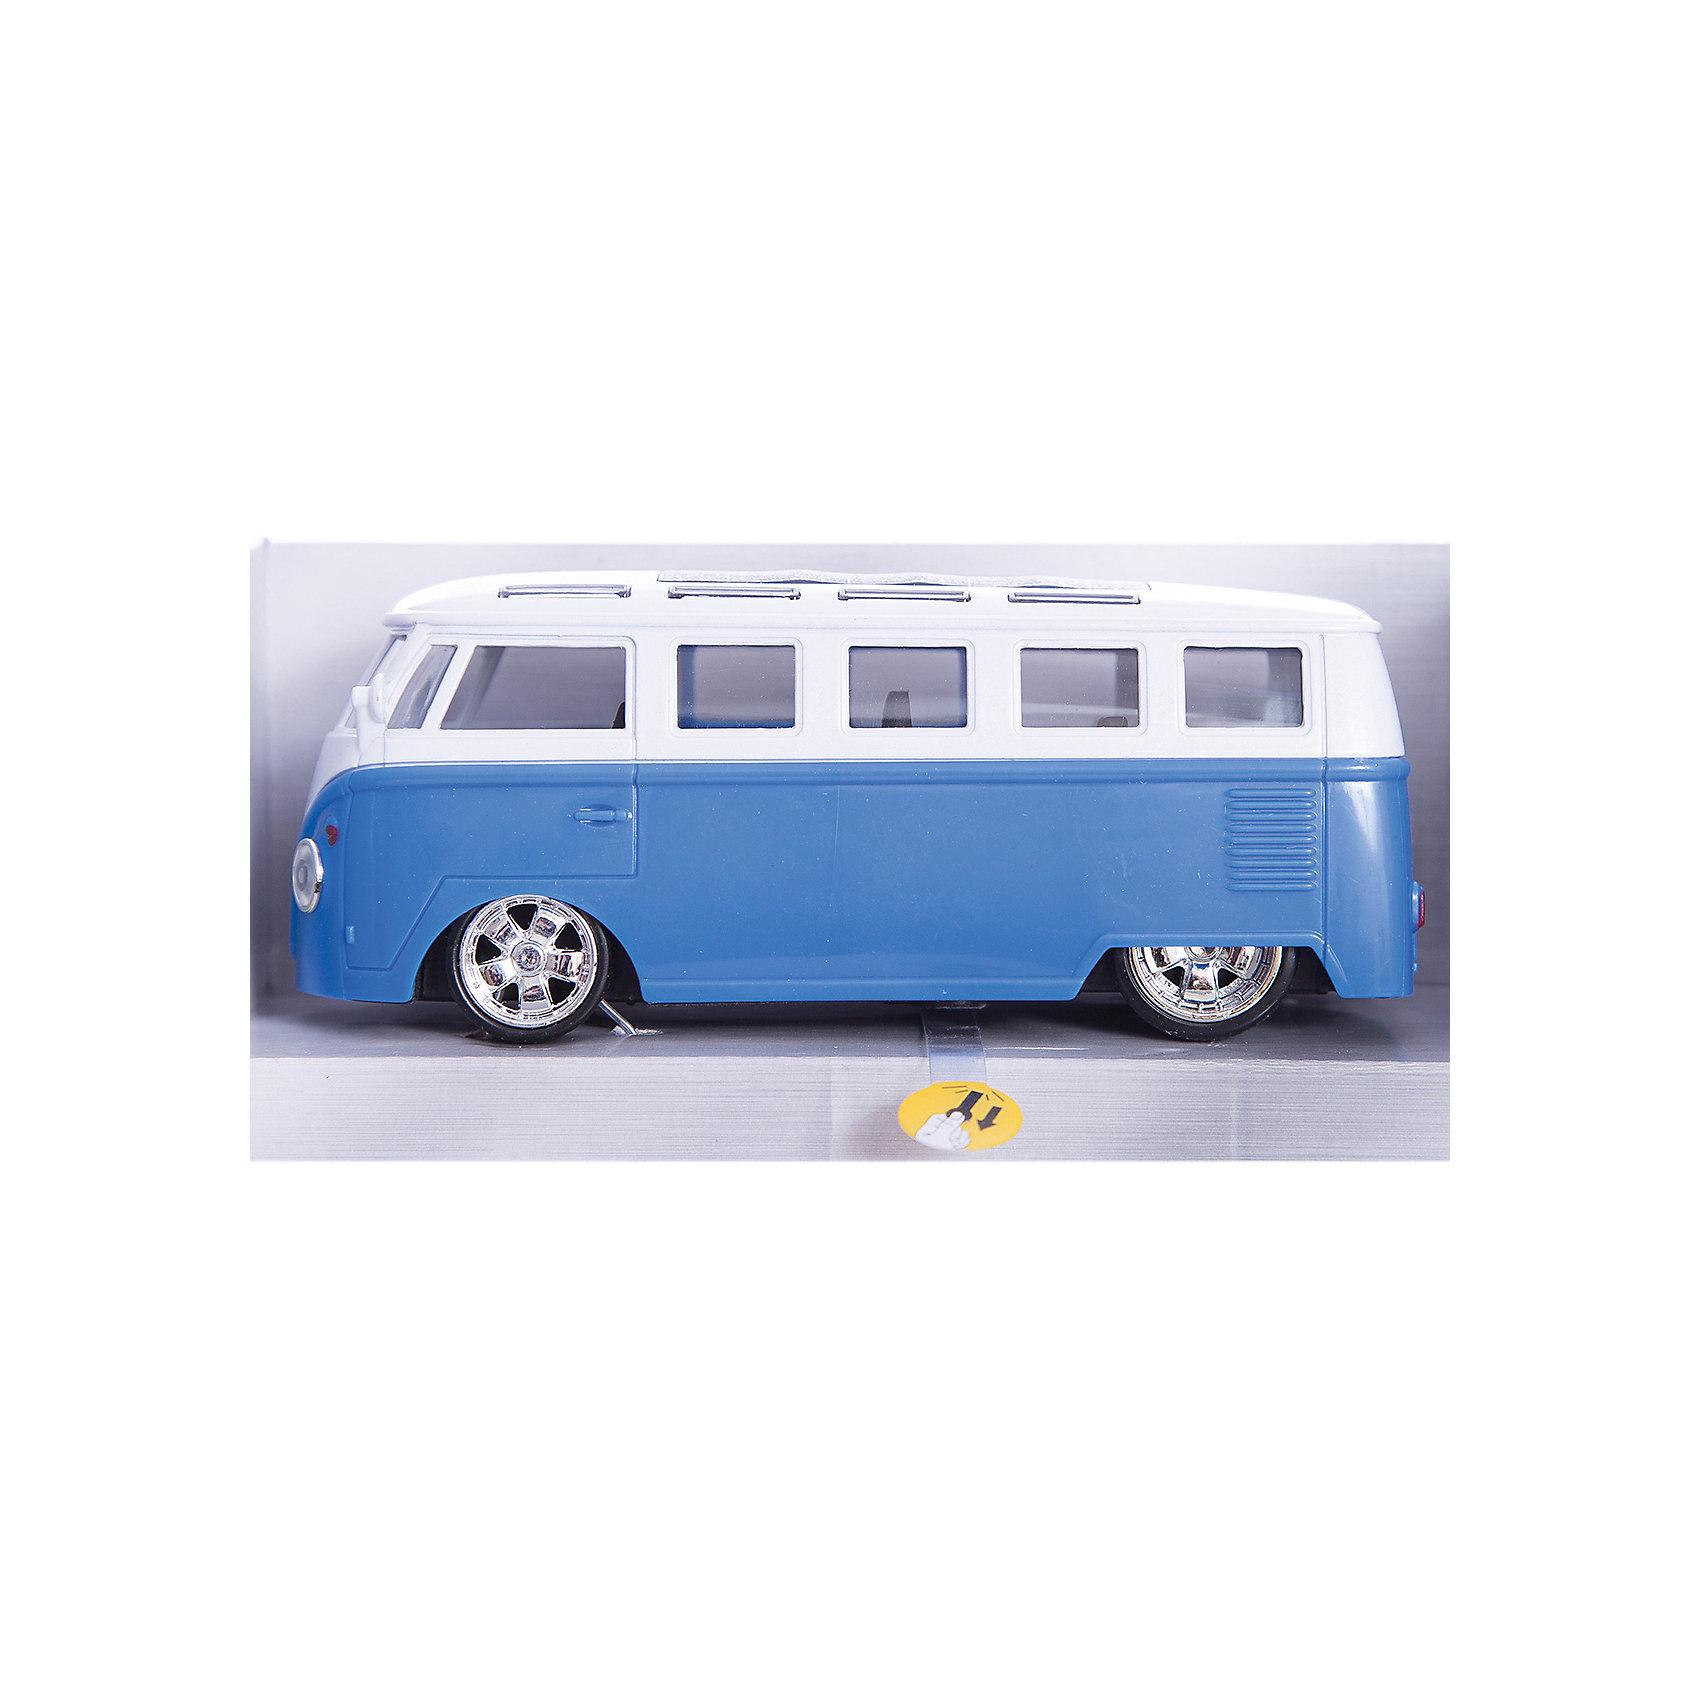 Автобус , 12,5см, свет+звук, ТЕХНОПАРК